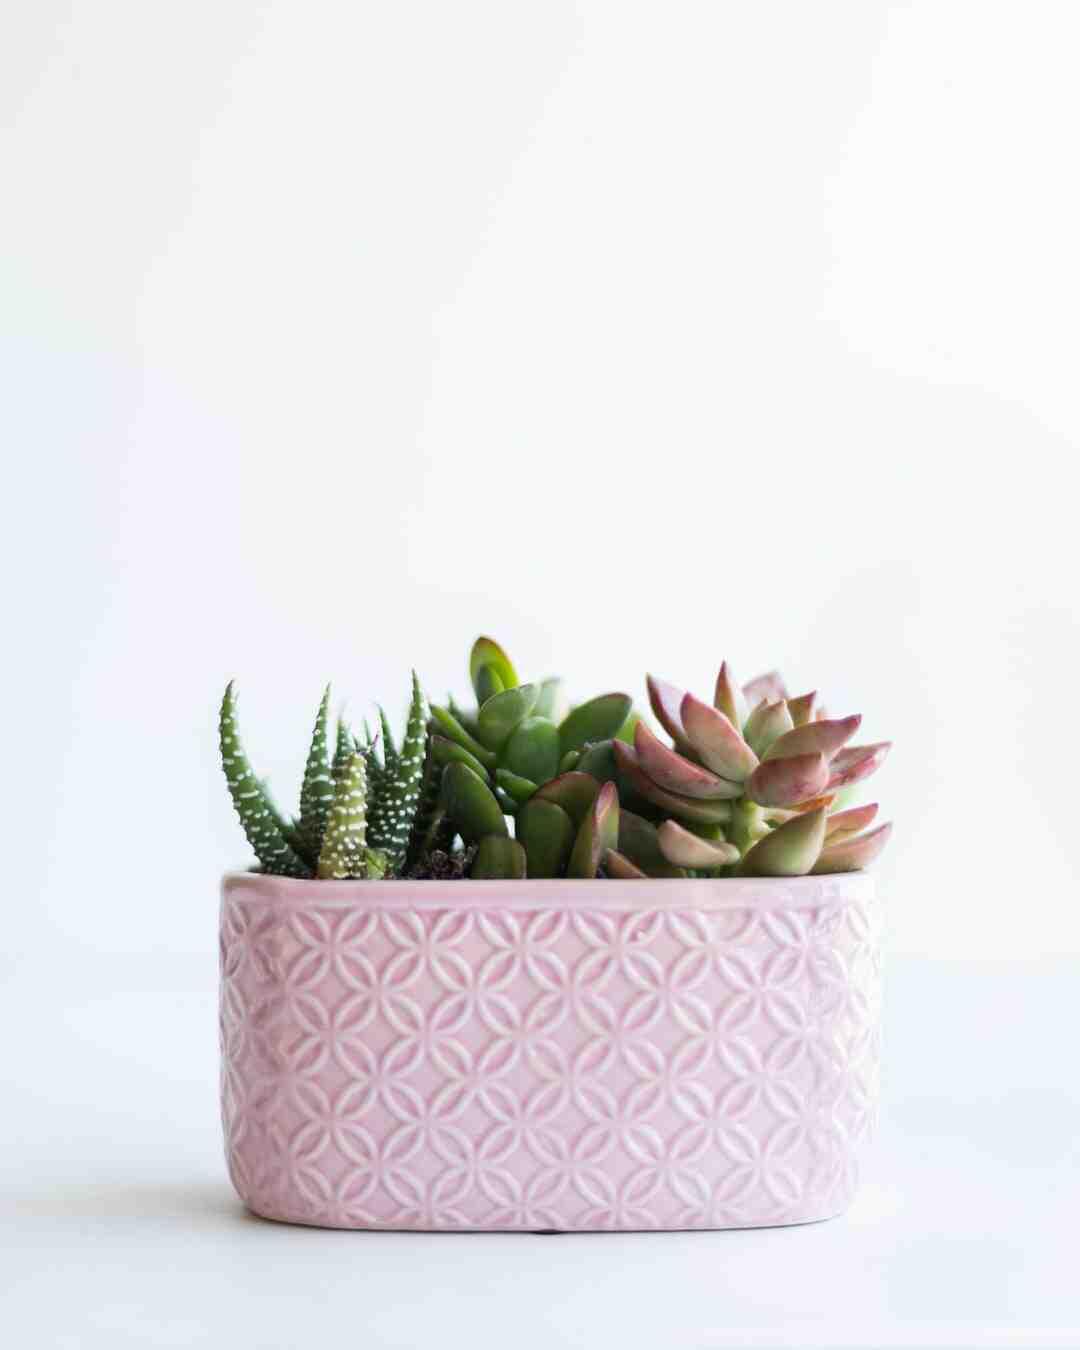 Comment entretenir une plante succulente